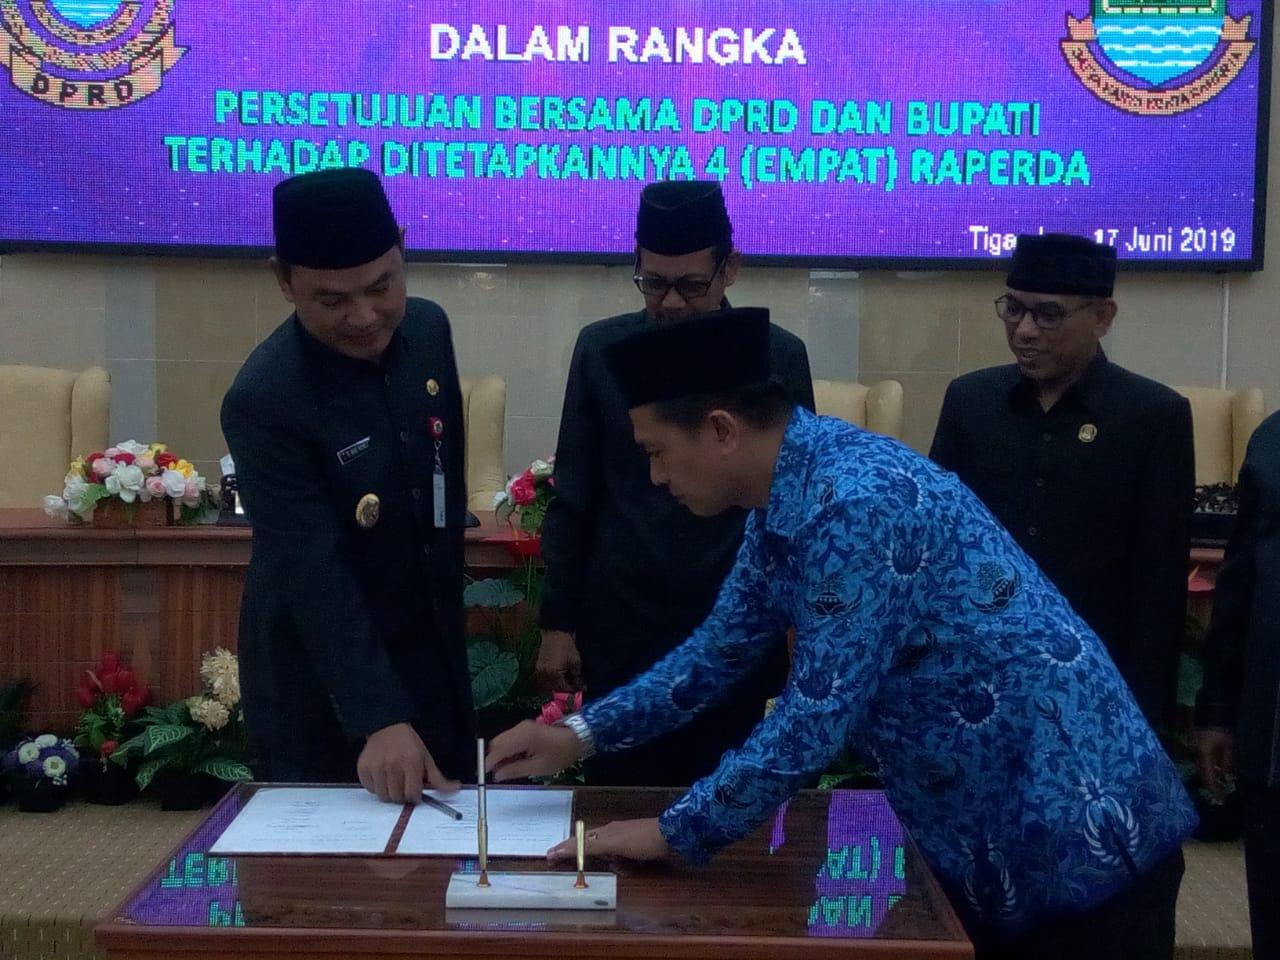 Ketua DPRD Kabupaten Tangerang, Sumardi saat menyerahkan dokumen Raperda kepada Wakil Bupati Tangerang, Mad Romli dalam Rapat Paripurna di Gedung DPRD Kabupaten Tangerang, Senin (17/6/2019).